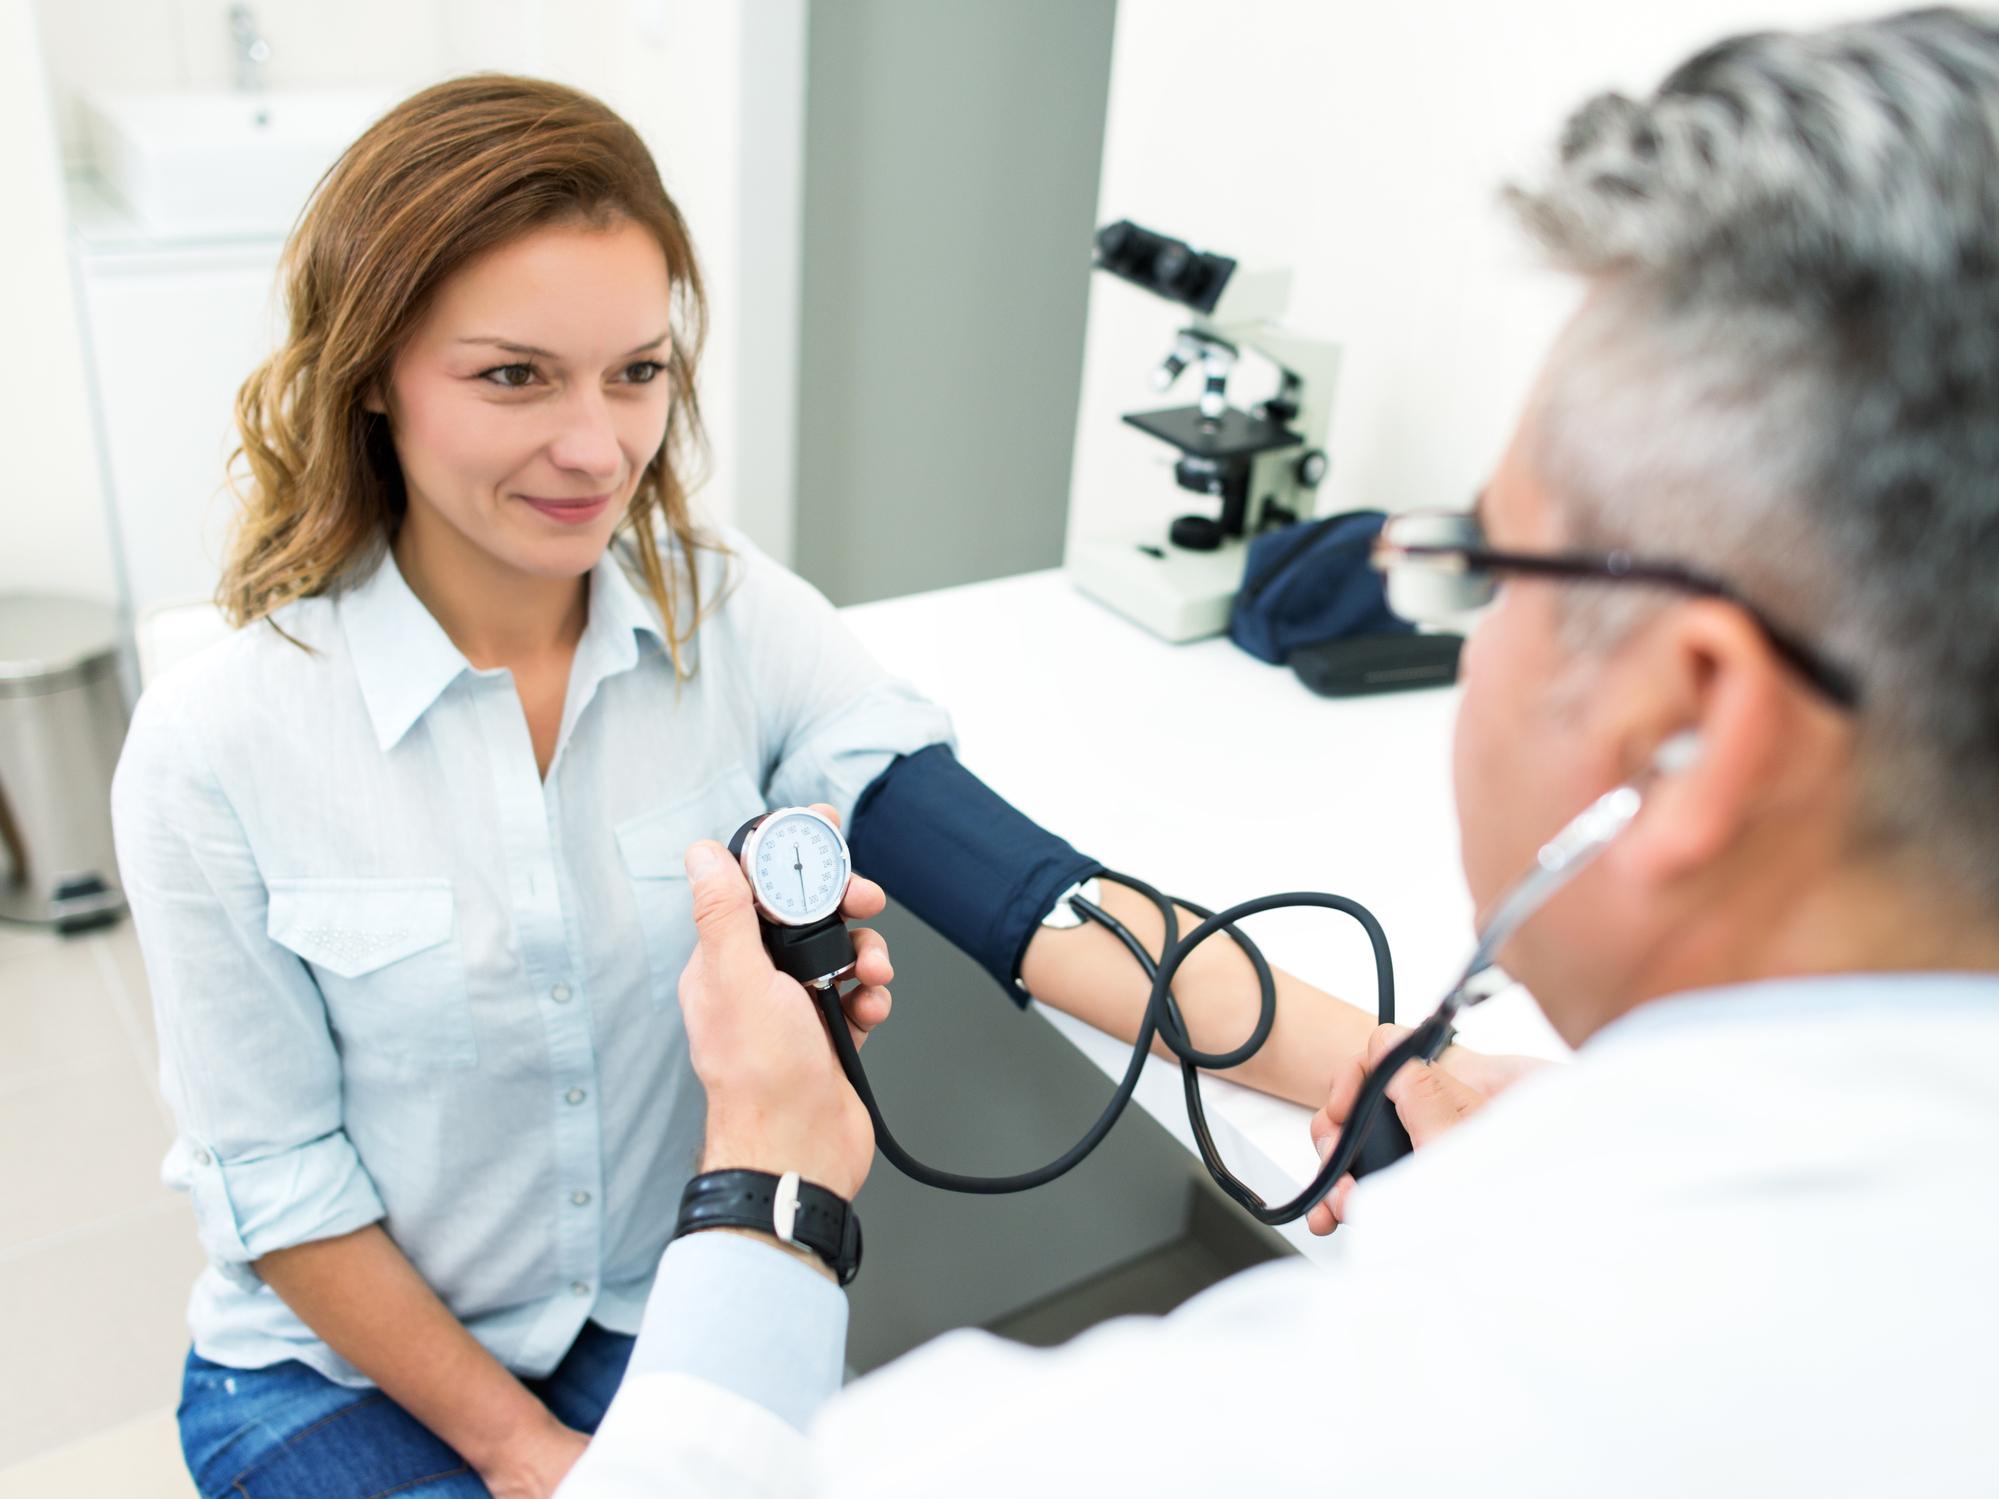 hipertónia gyomorhurut meleg padló magas vérnyomás